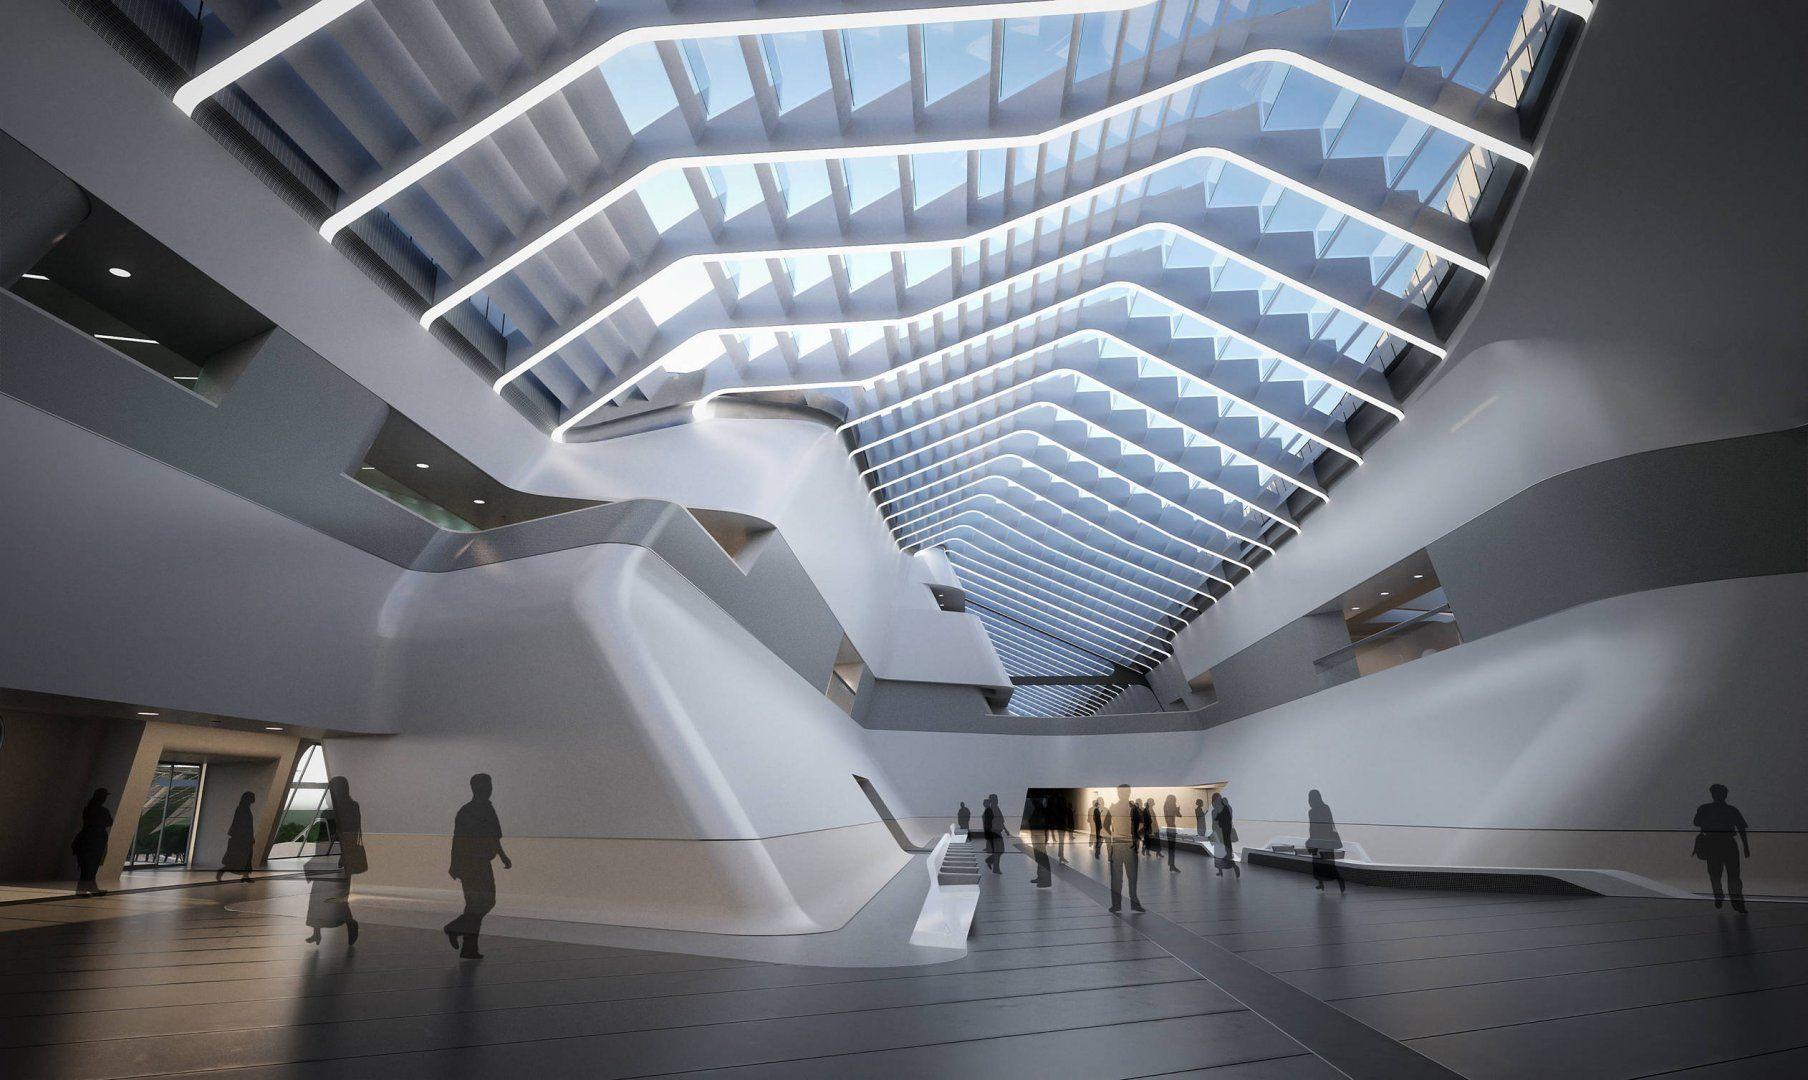 Napoli Afragola High Speed Train Station In Naples Italy By Zaha Hadid Architects